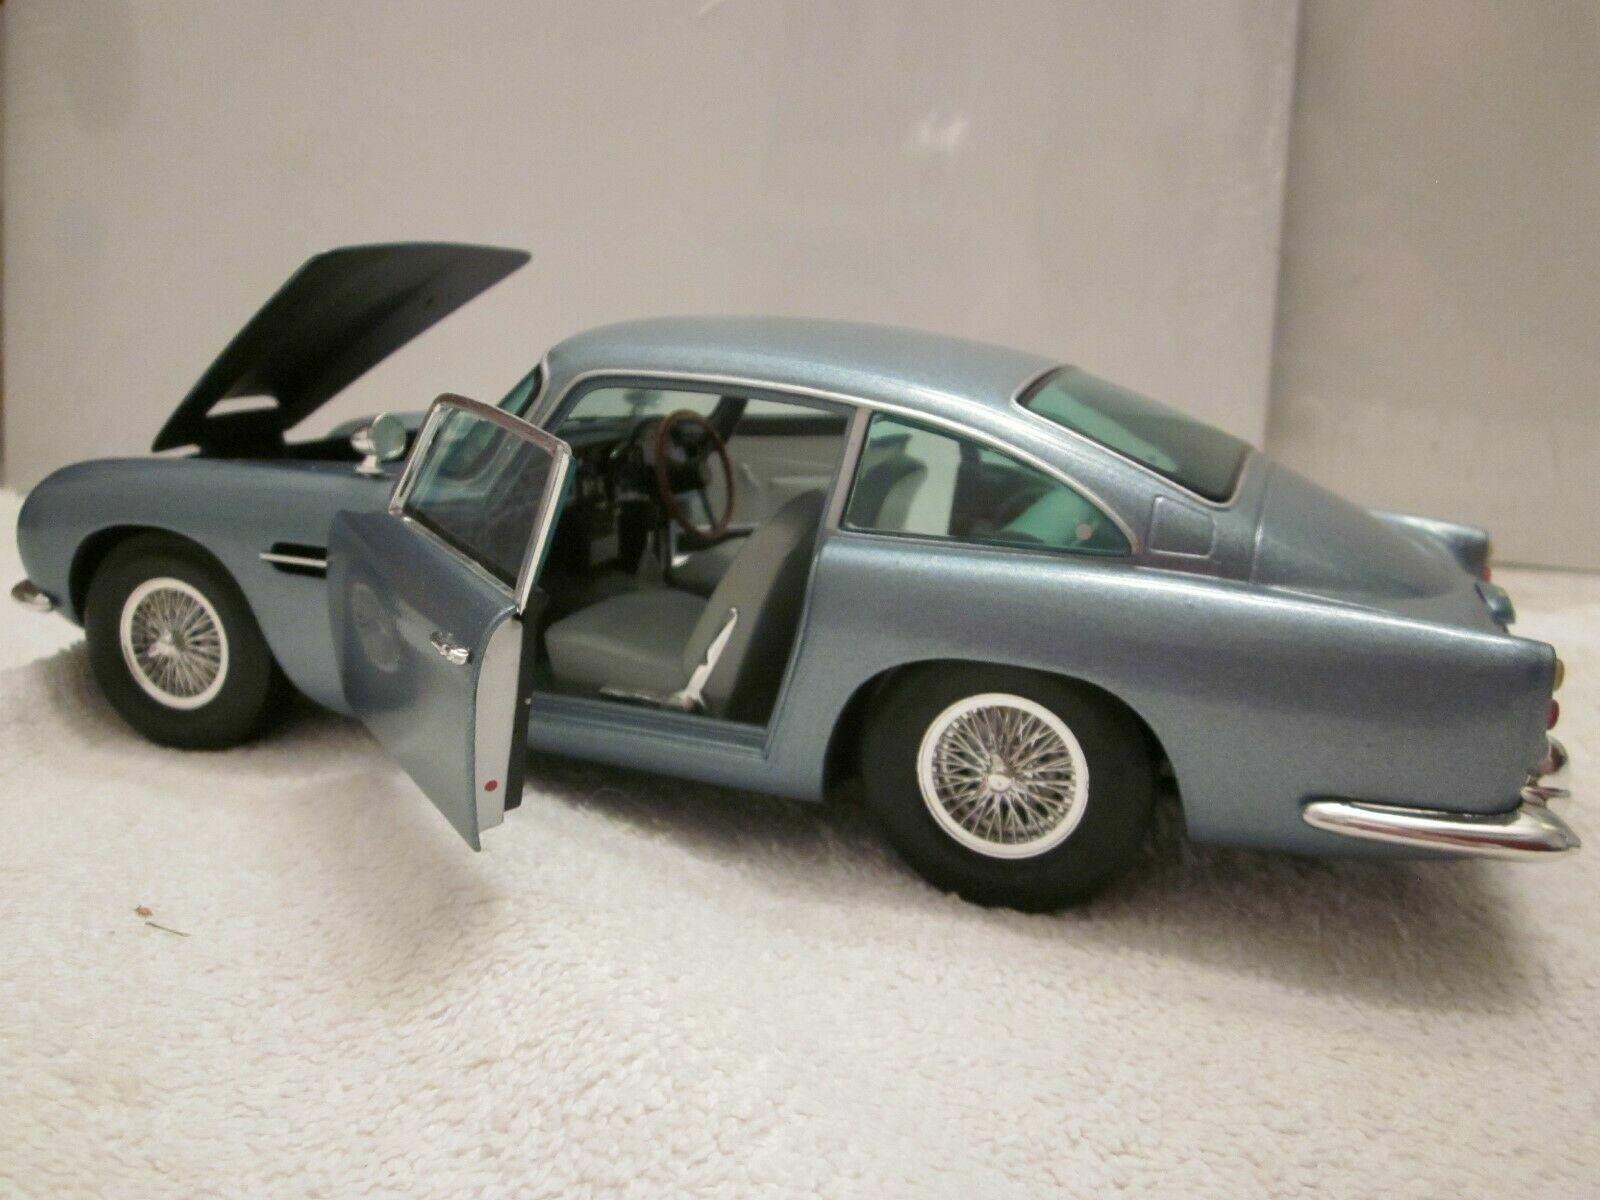 Chrono Die-cast Metallic Ice Blue 1963 Aston Martin Db5 1 18 Scale H1003 MIB